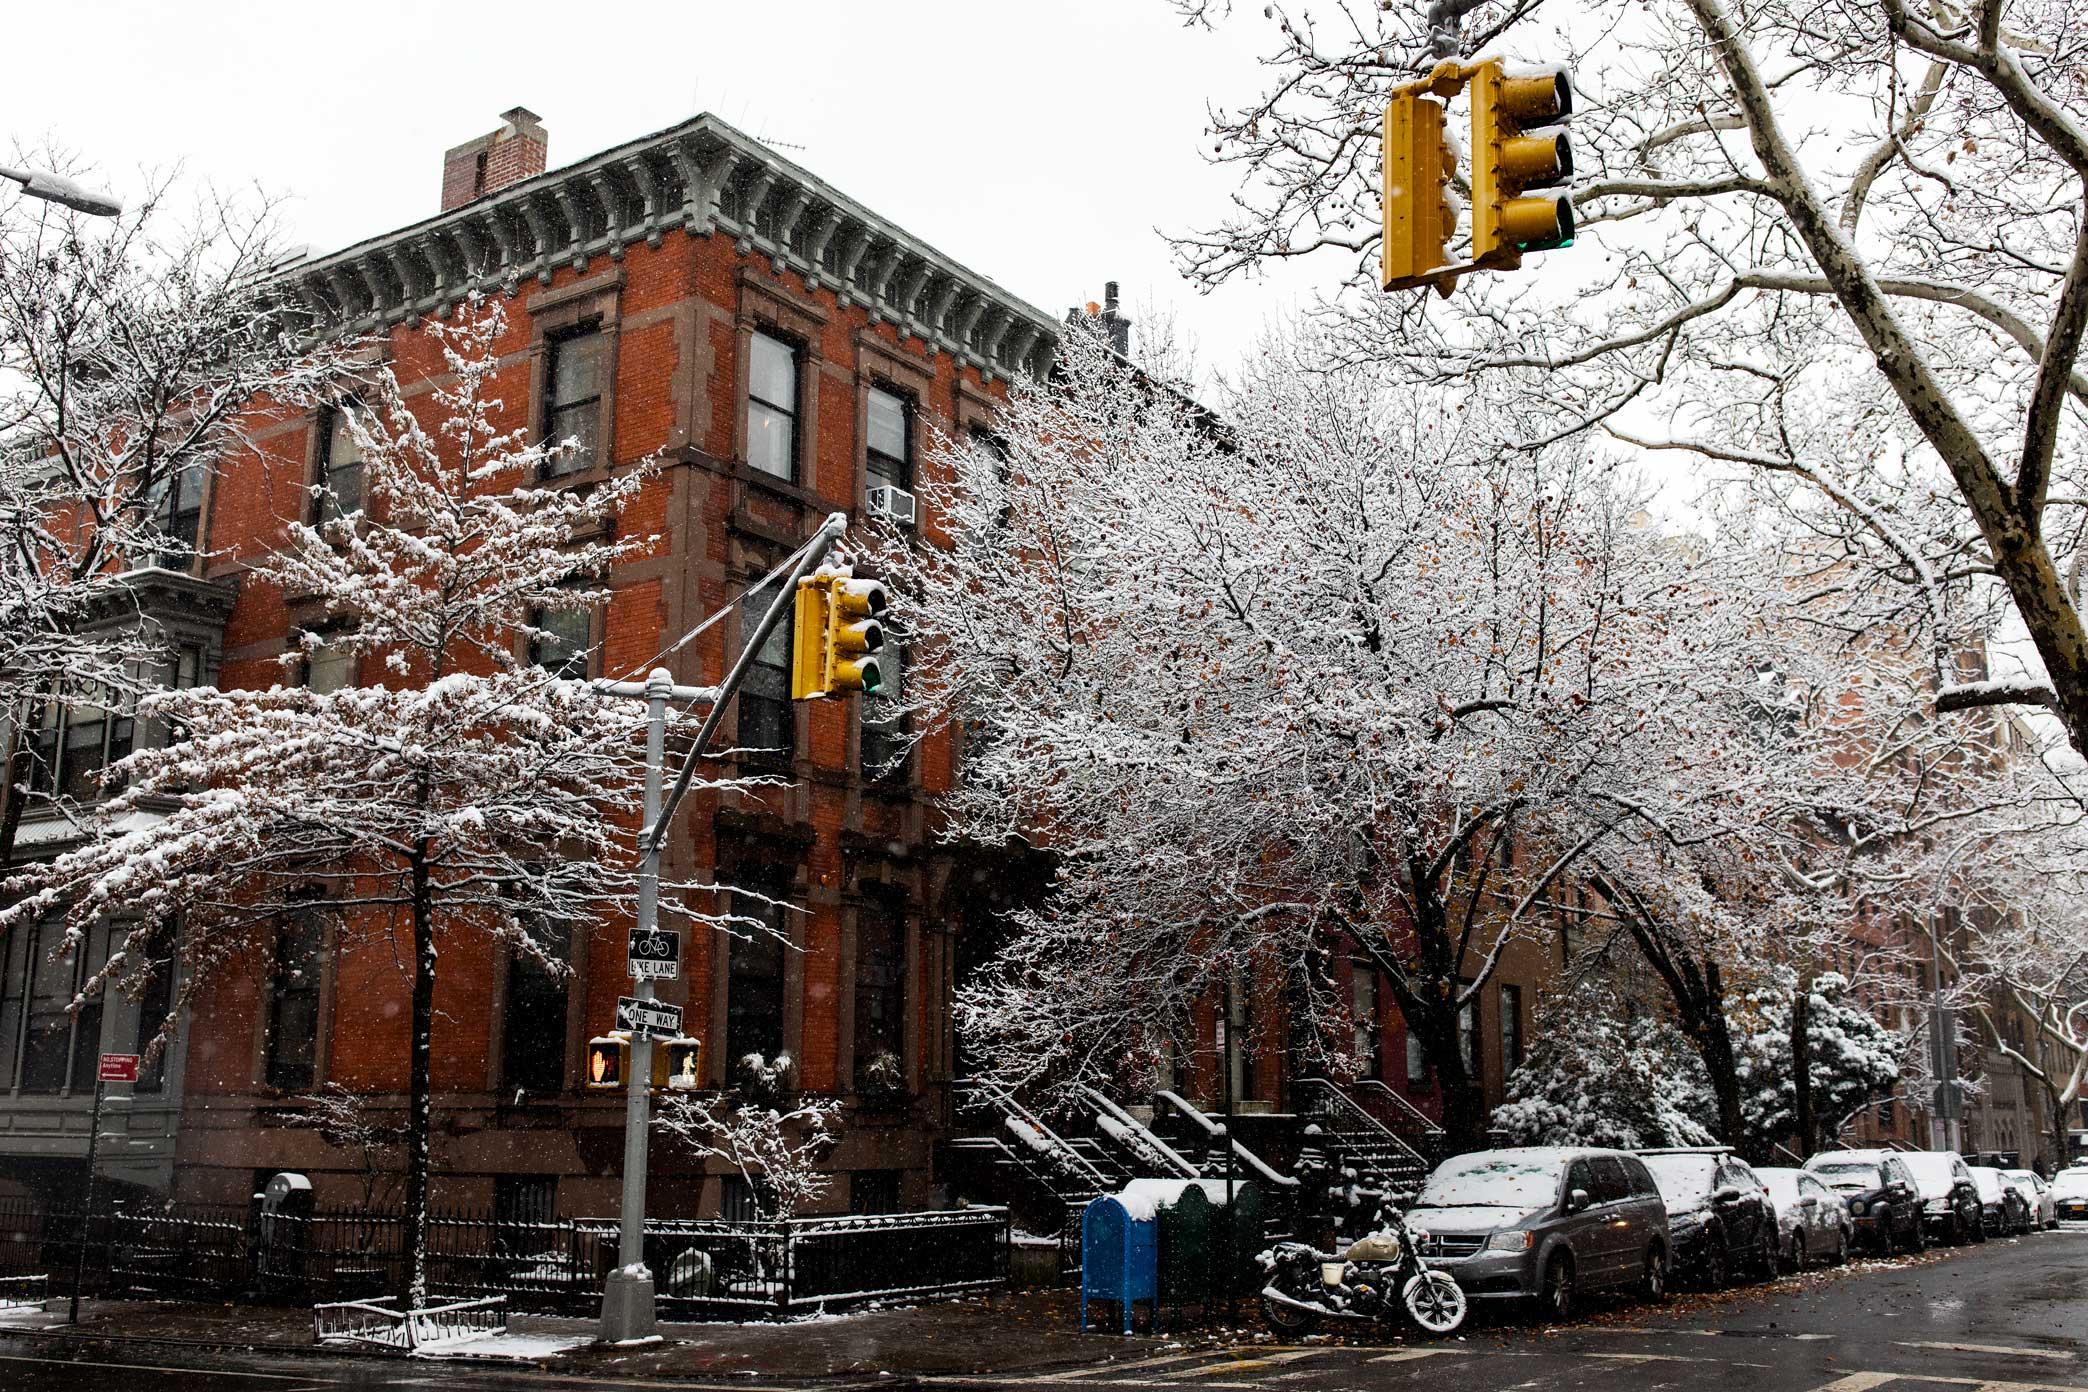 Brooklyn Streets. Brooklyn, New York. 2017